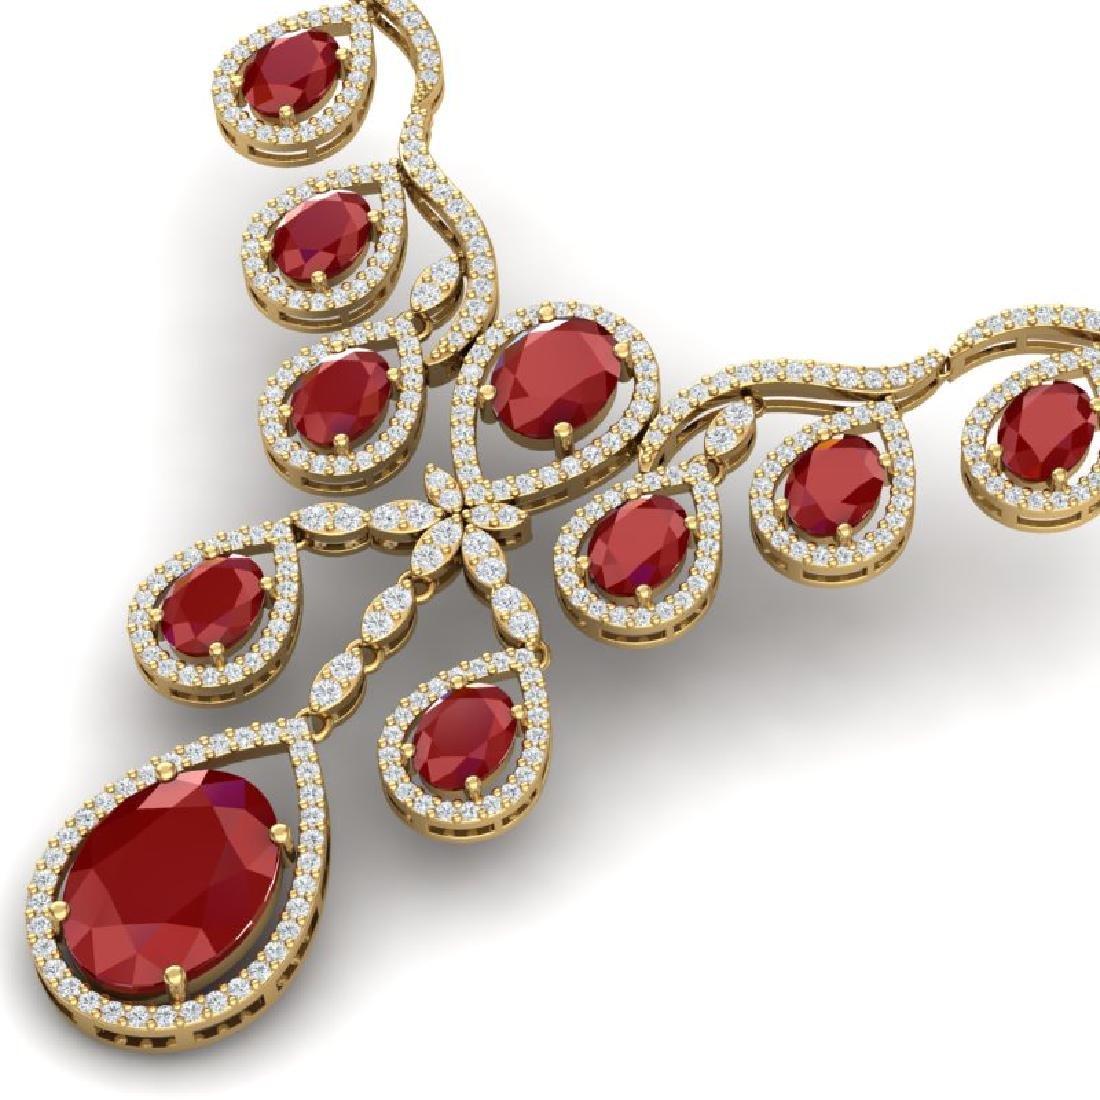 37.66 CTW Royalty Ruby & VS Diamond Necklace 18K Yellow - 2